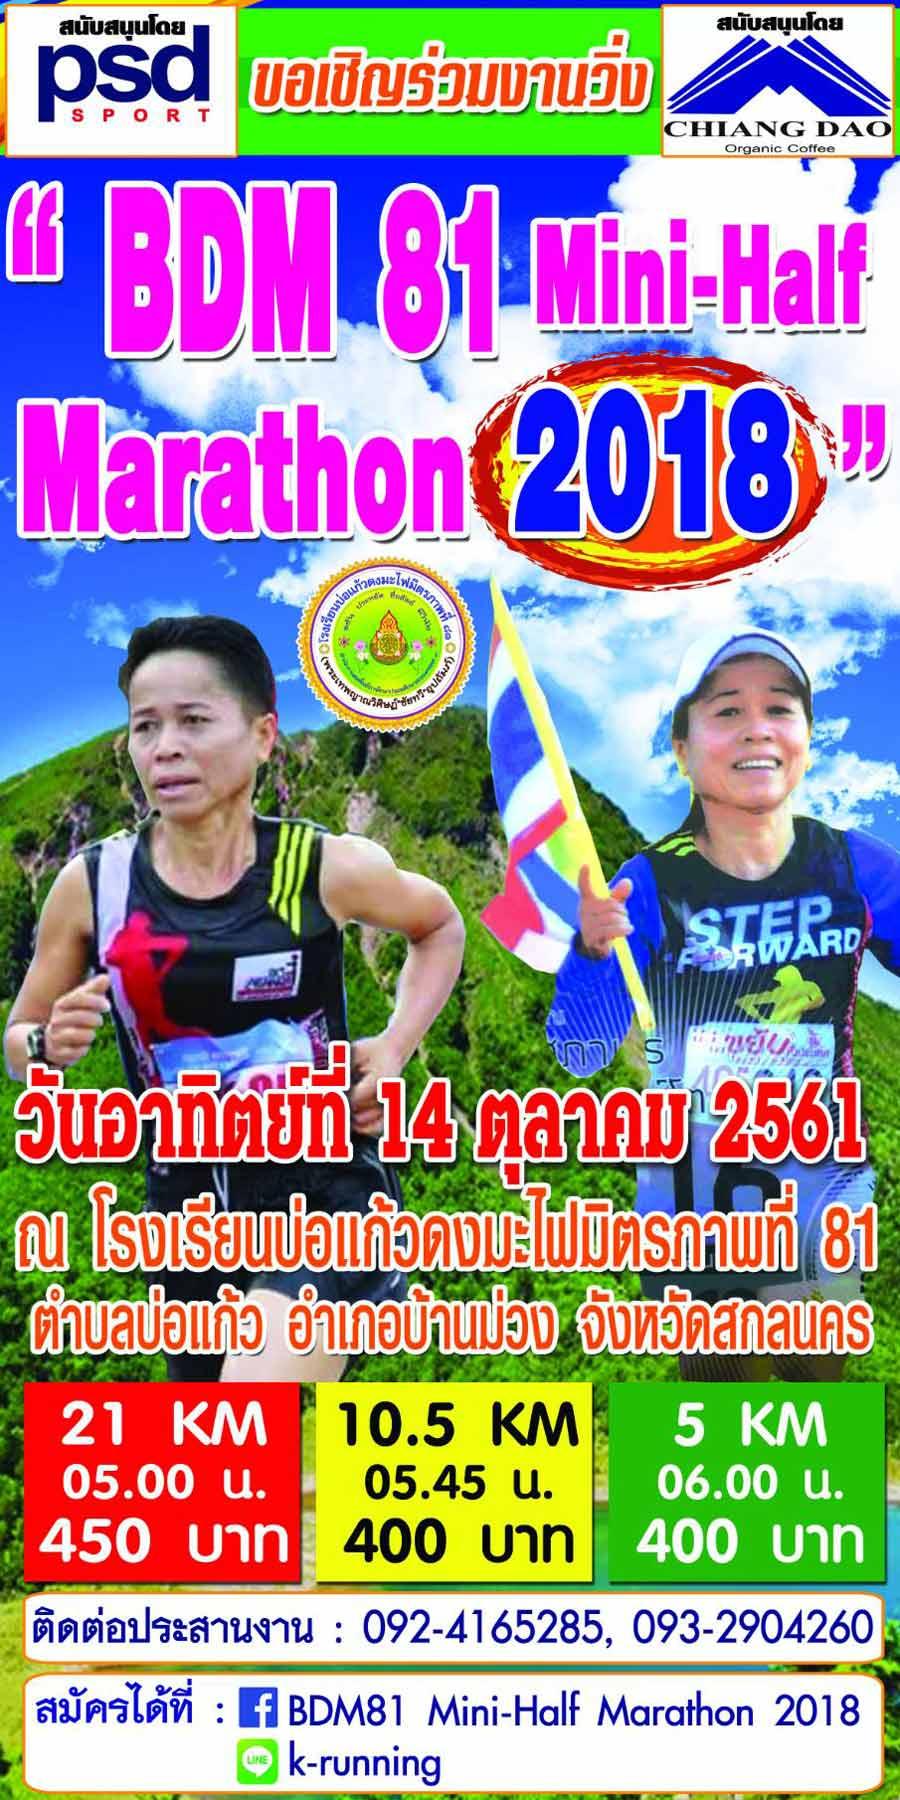 BDM 81 Mini-Half Marathon 2018 (เลื่อนไปจัด 9 ธันวาคม 2561 ...